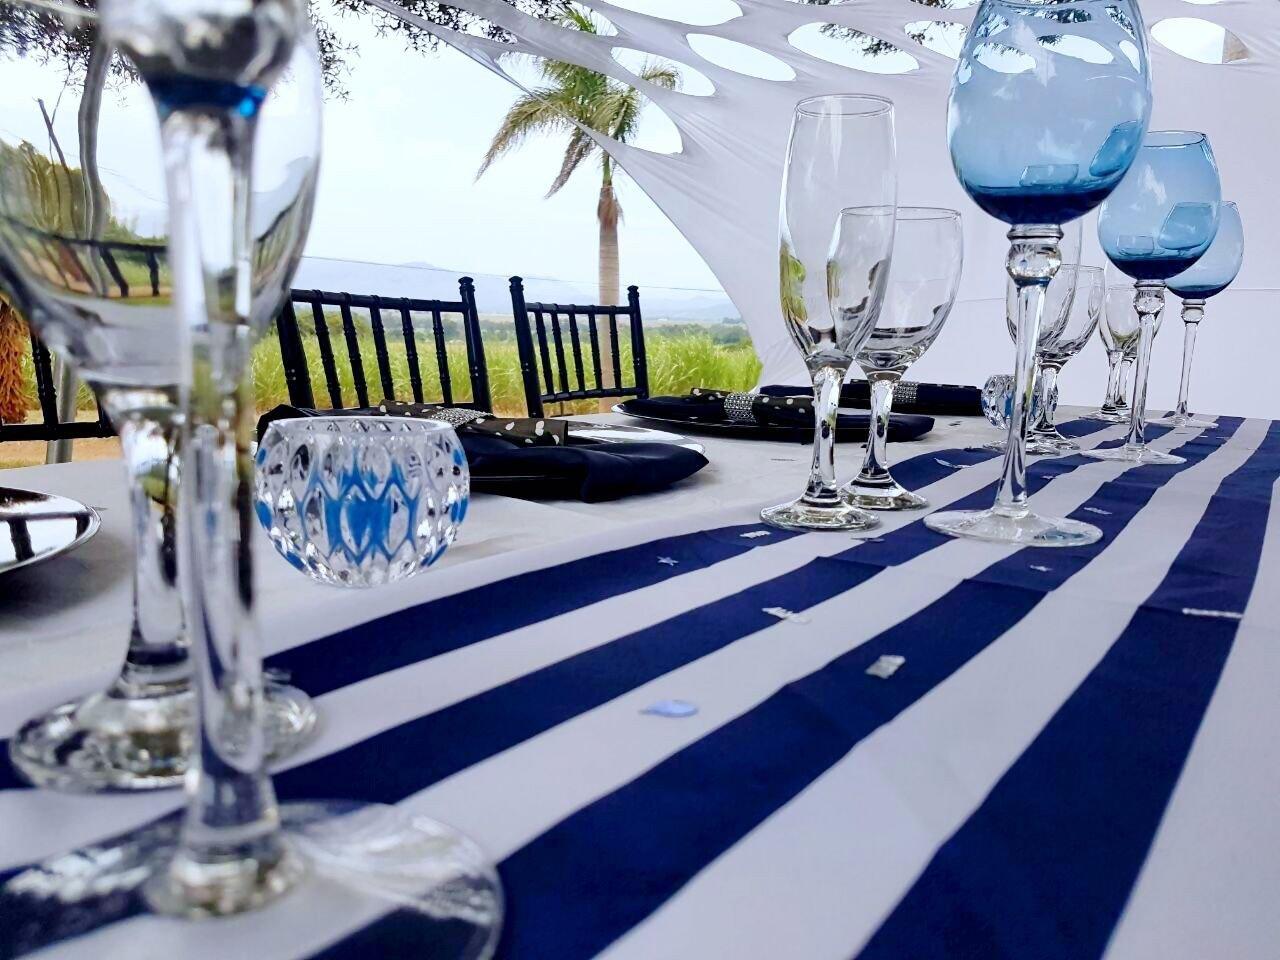 Navy Blue and White Decor Elegant Black Navy Blue and White Party Decor Shongaevents Shongaevents